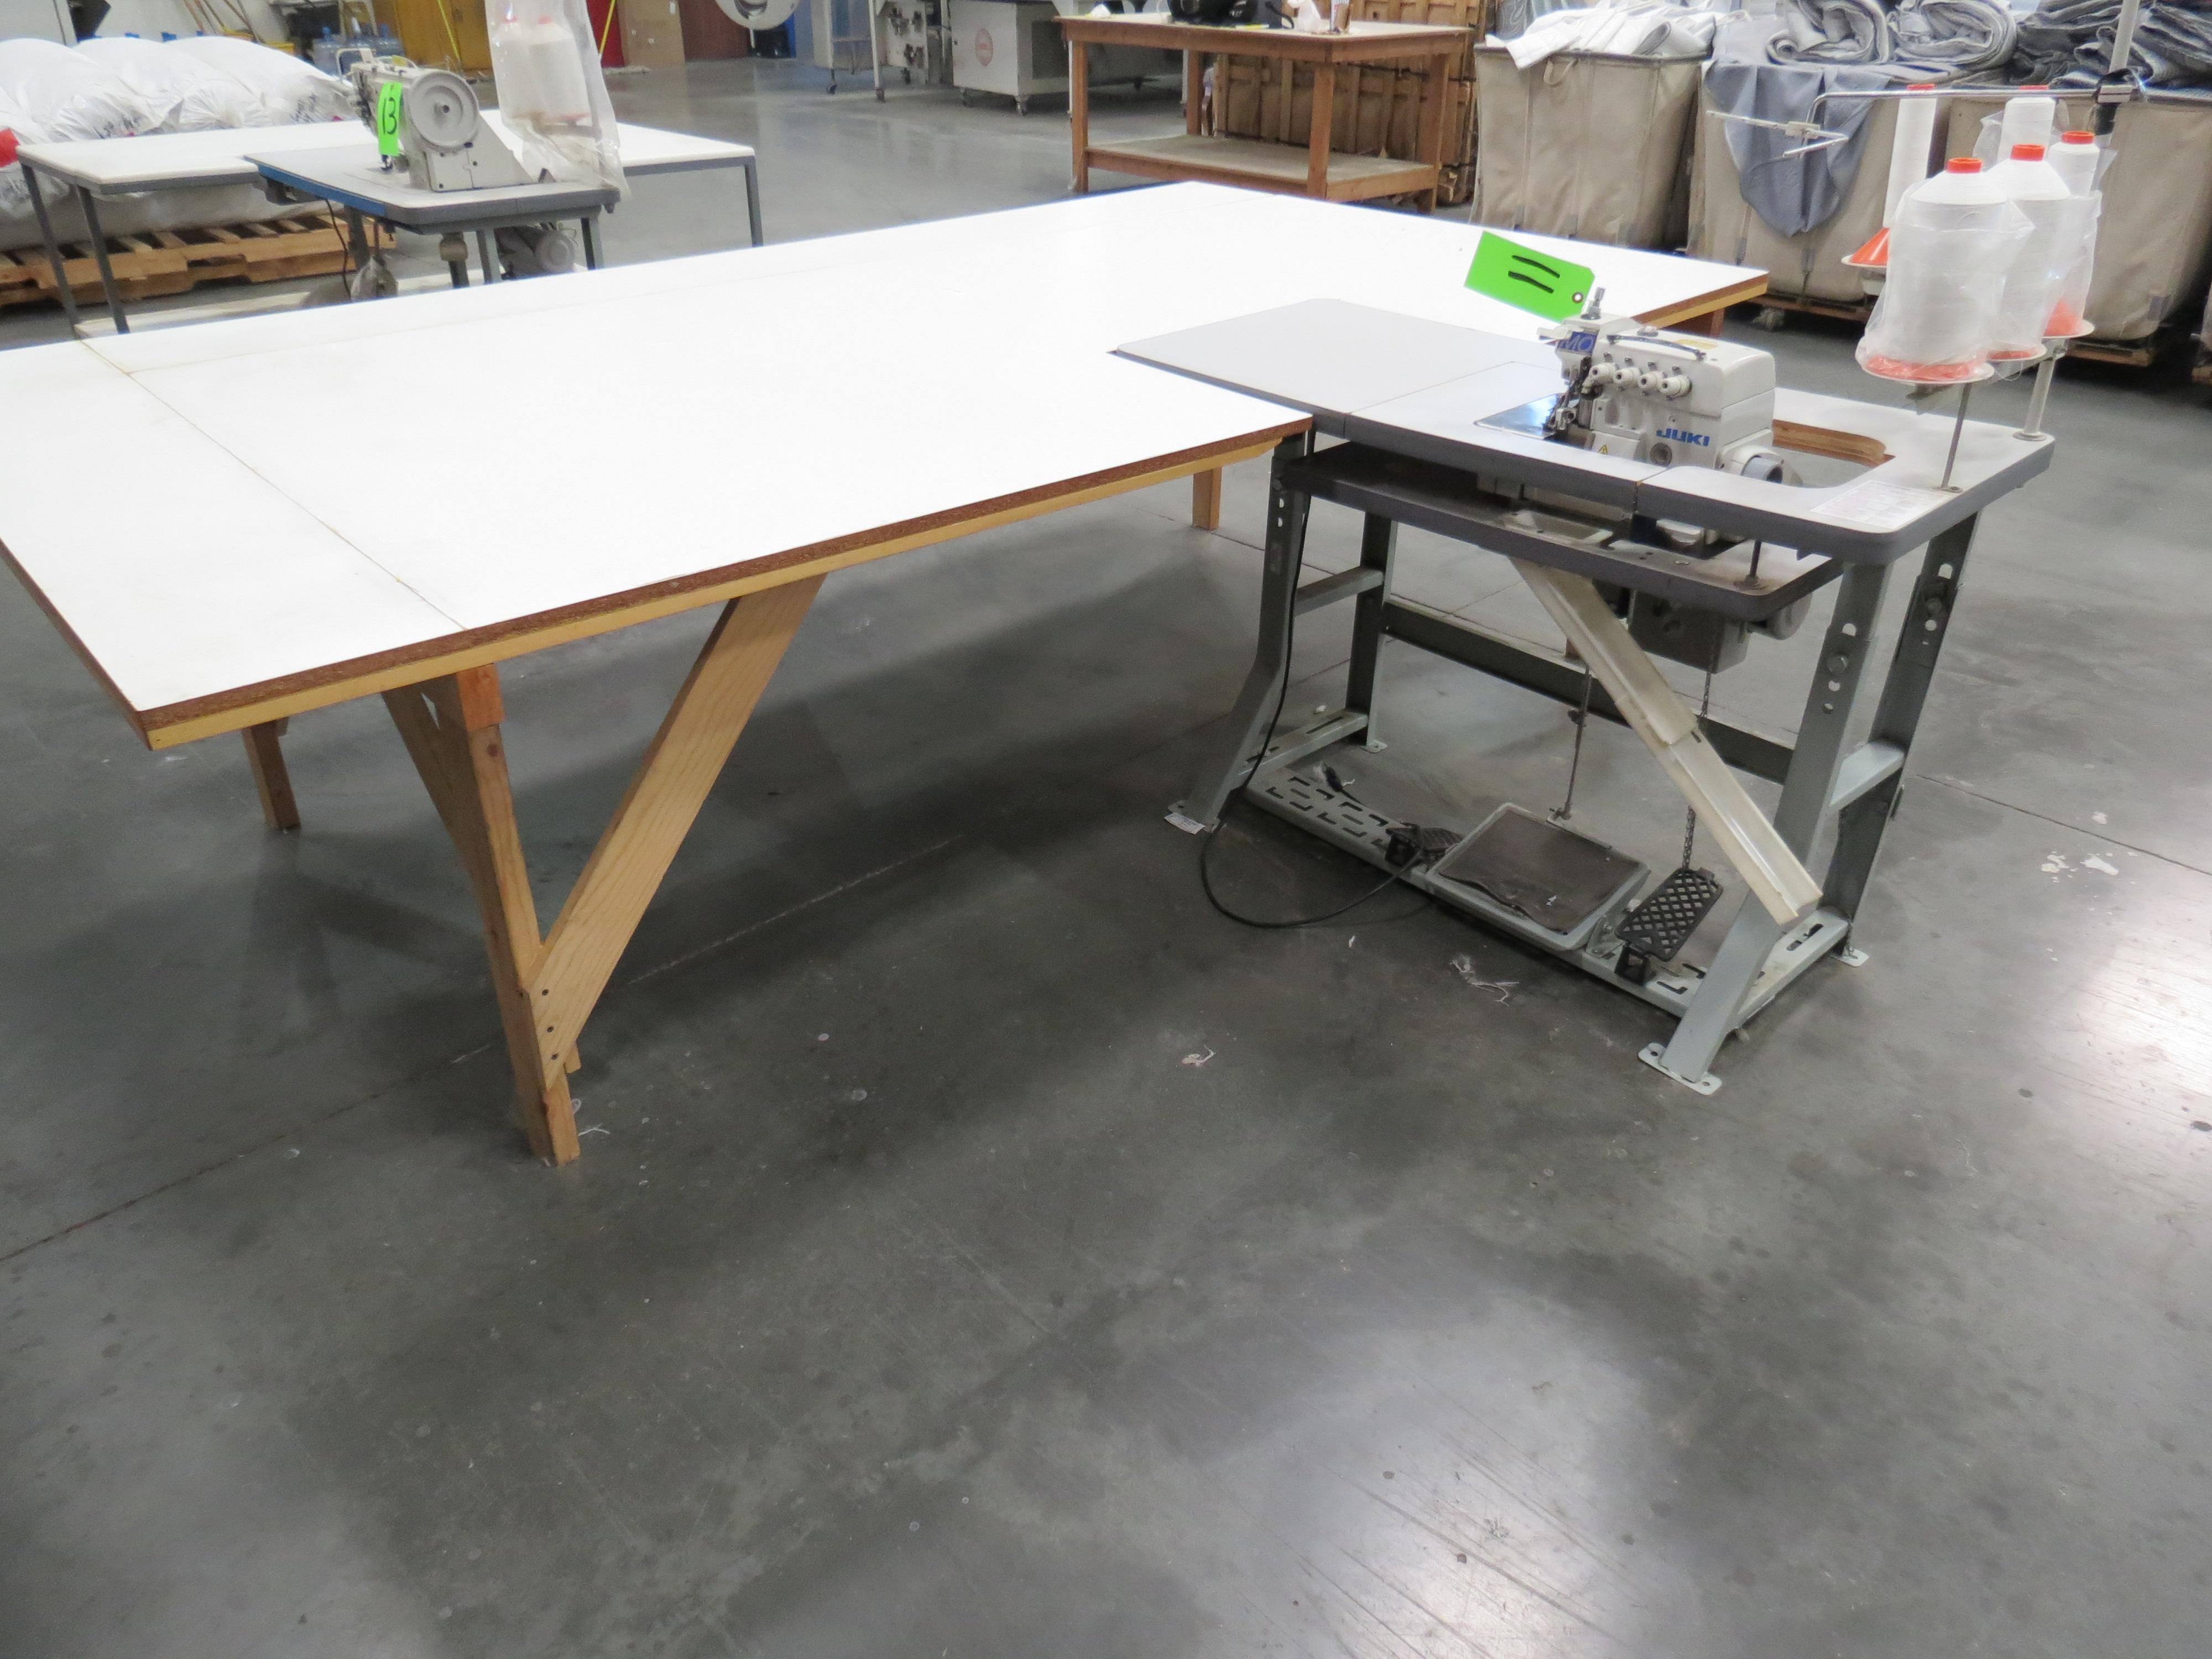 Juki MO-6816SOverlock Sewing Machine, 110V, SN:RM0JJ03880 with Table